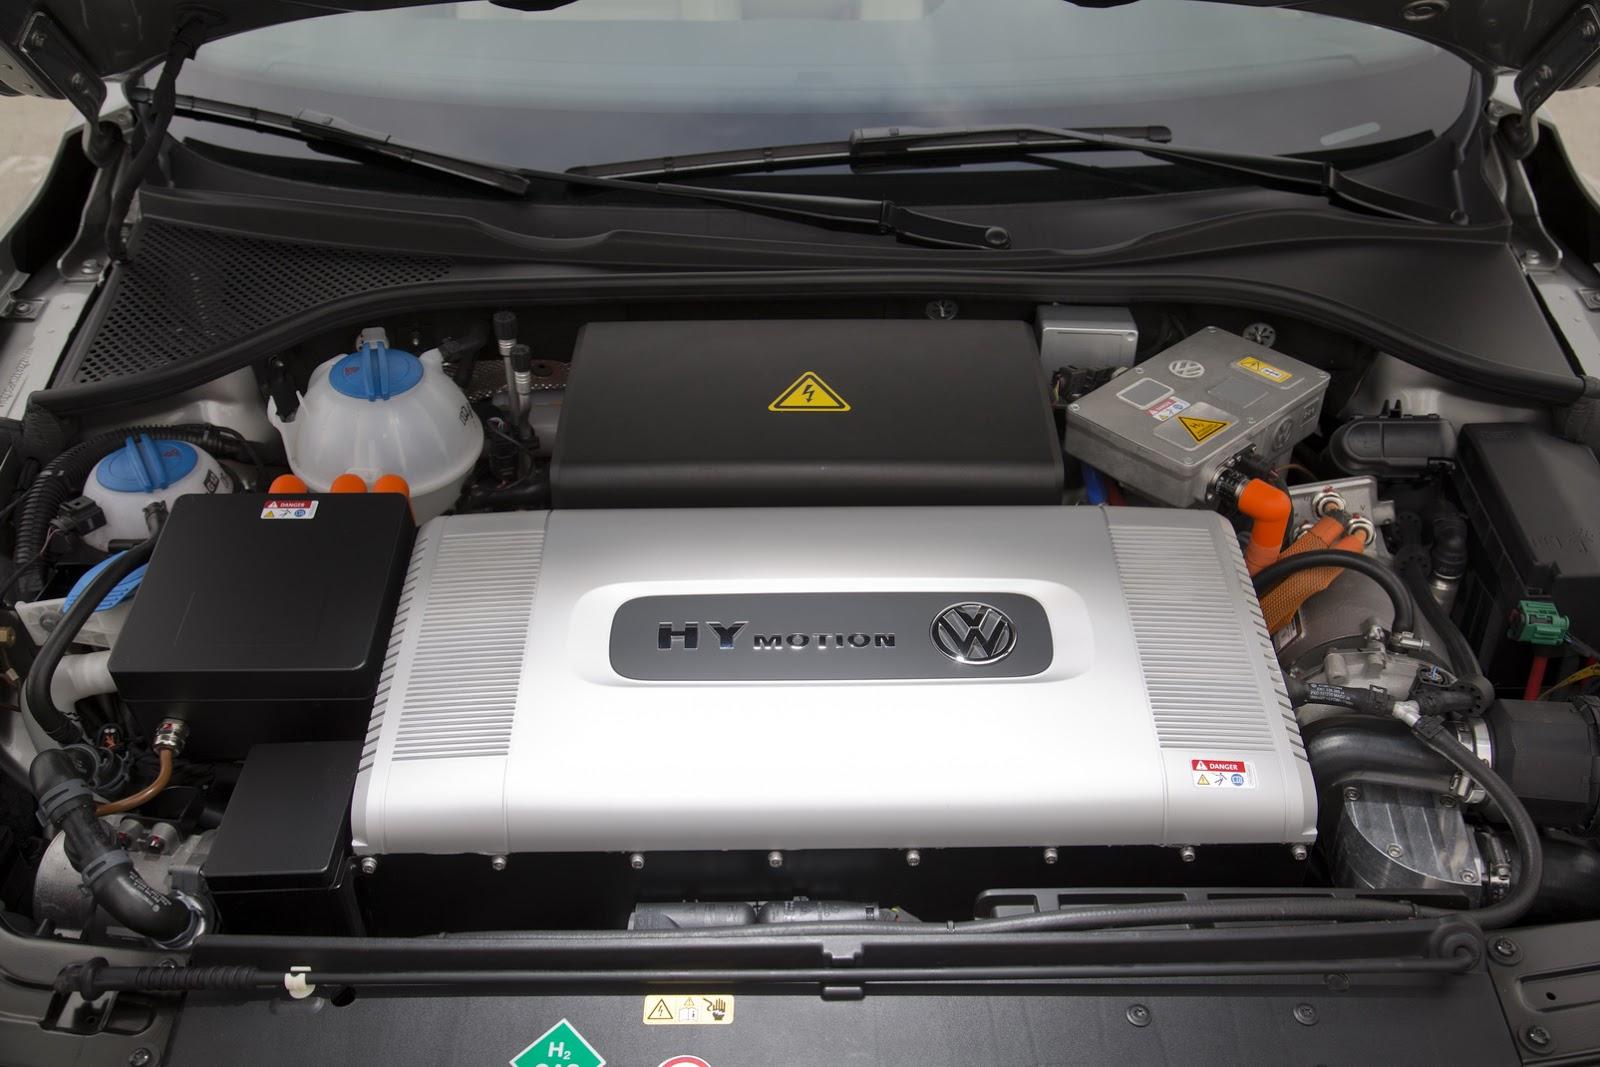 Volkswagen motor a hidrogénio